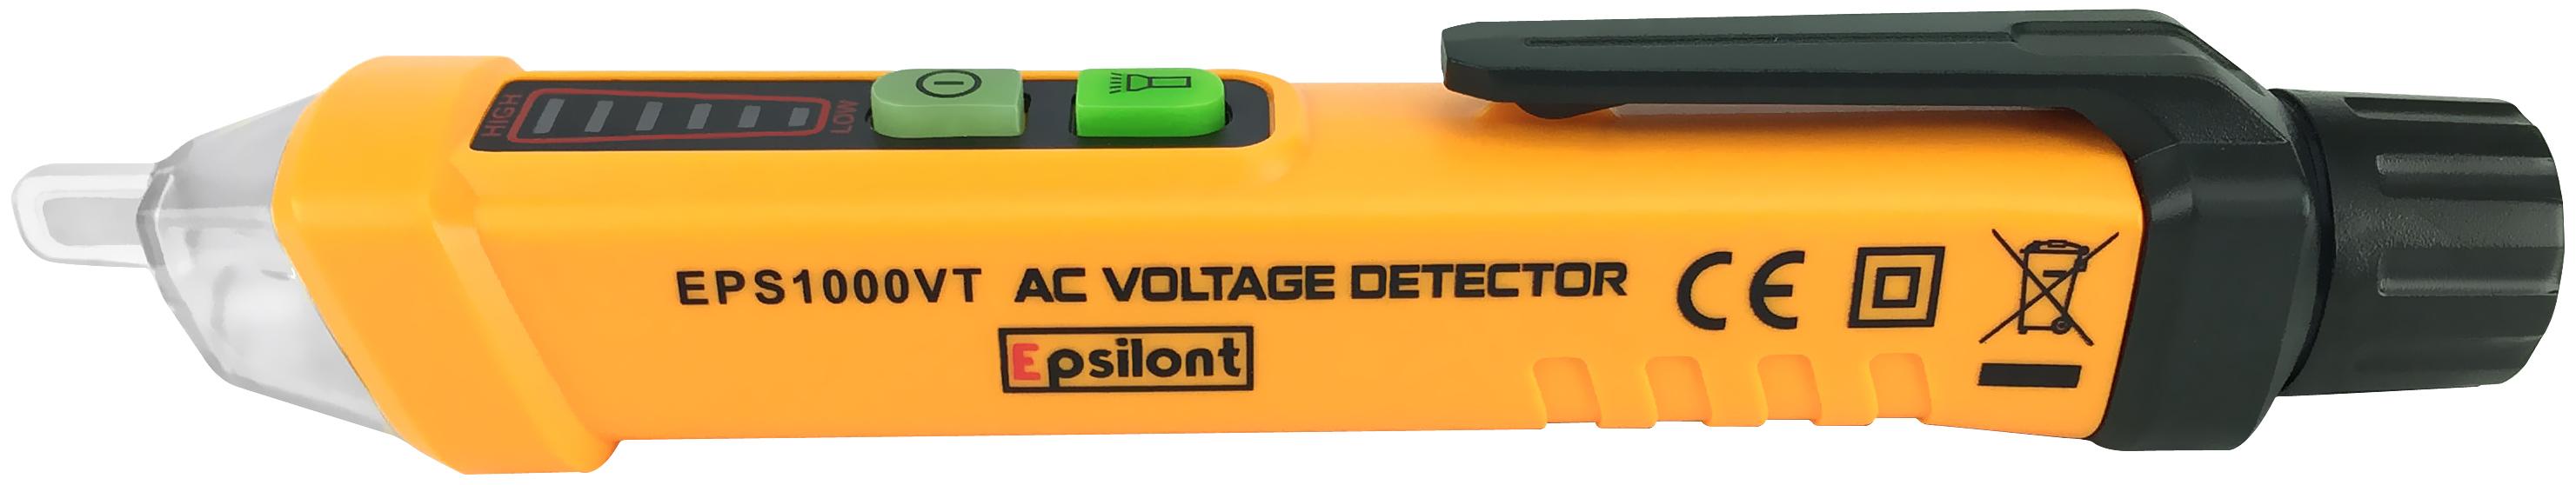 Epsilont Voltage Tester Pen Ac Detector For Use On 50 60hz Circuits 12v 1000v Sale 1995